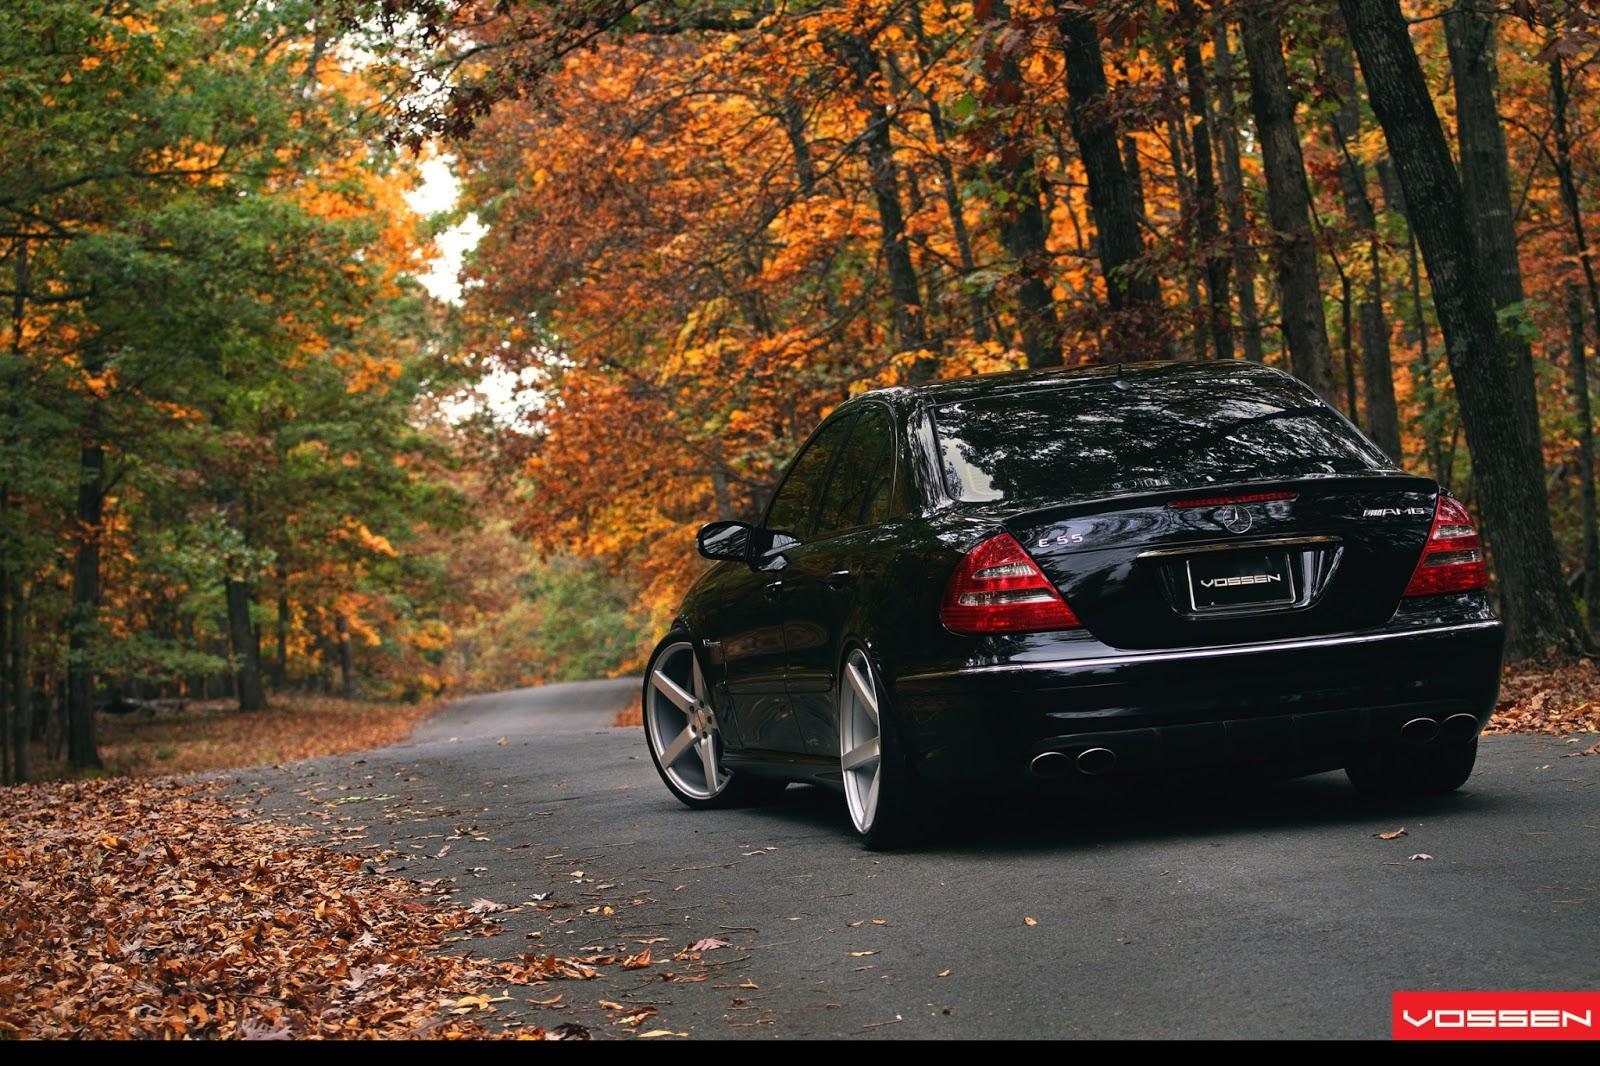 Mercedes Benz Amg >> Car Wallpapers: Mercedes-Benz E55 AMG